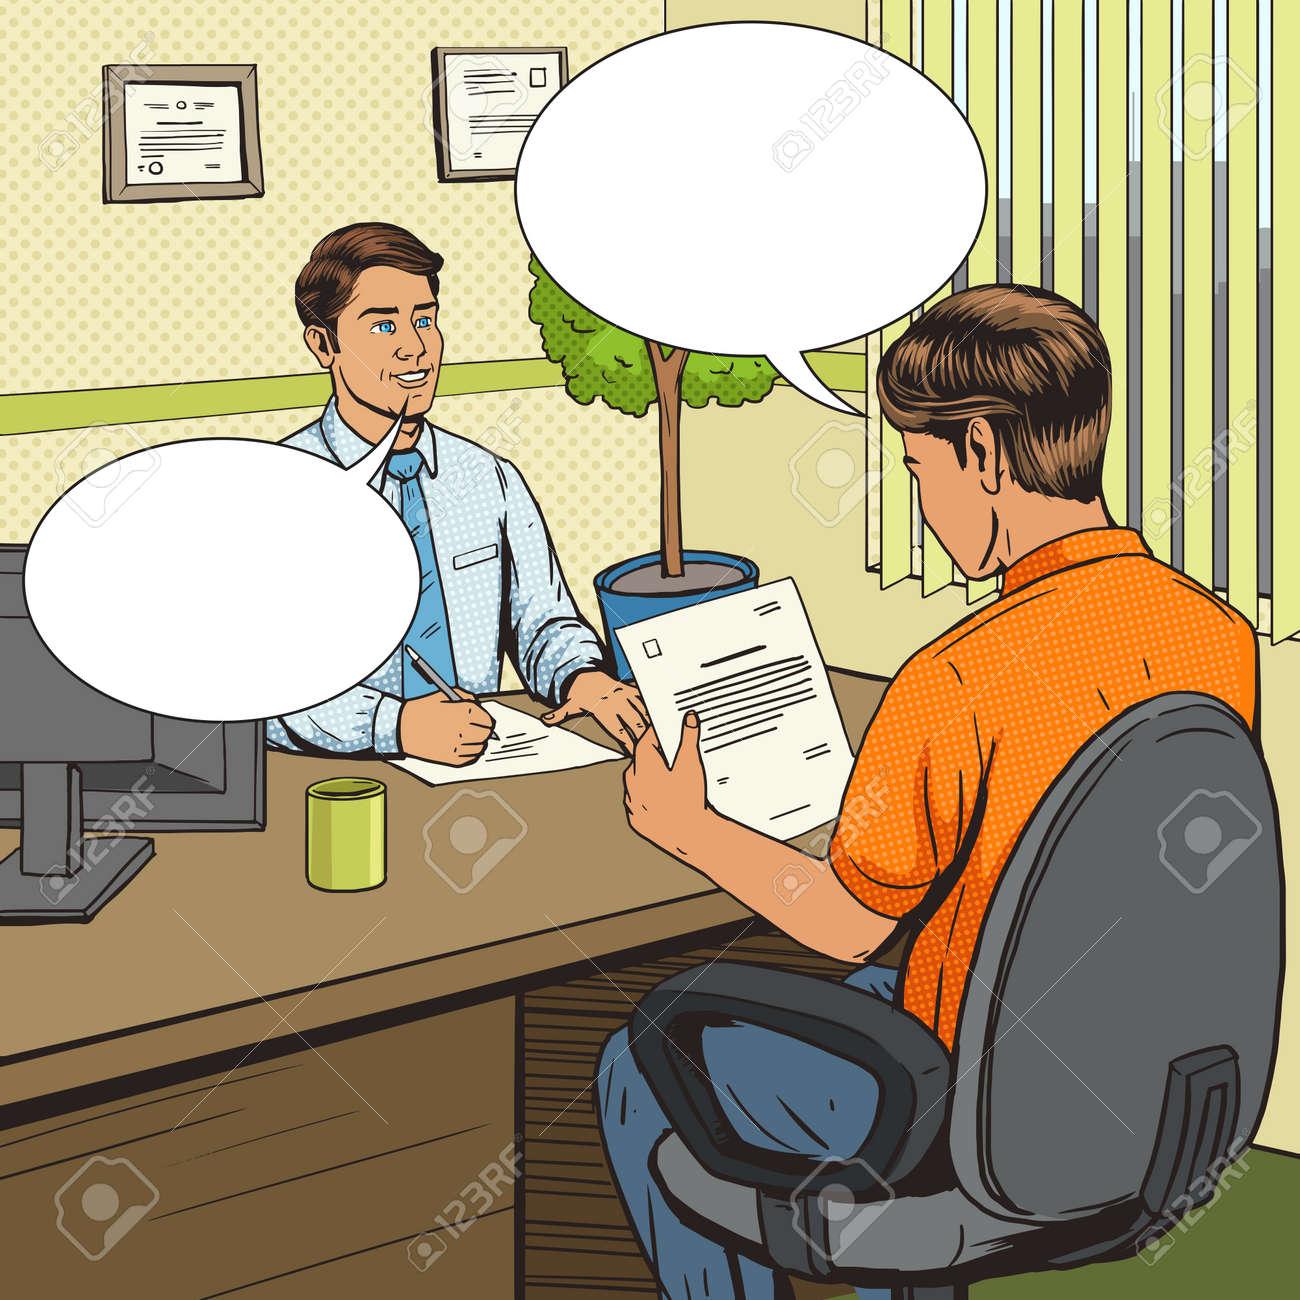 Businessman in bank office pop art retro style vector illustration. Comic book style imitation. Man talks with banker. Human illustration. Vintage retro style. Conceptual illustration - 58450244